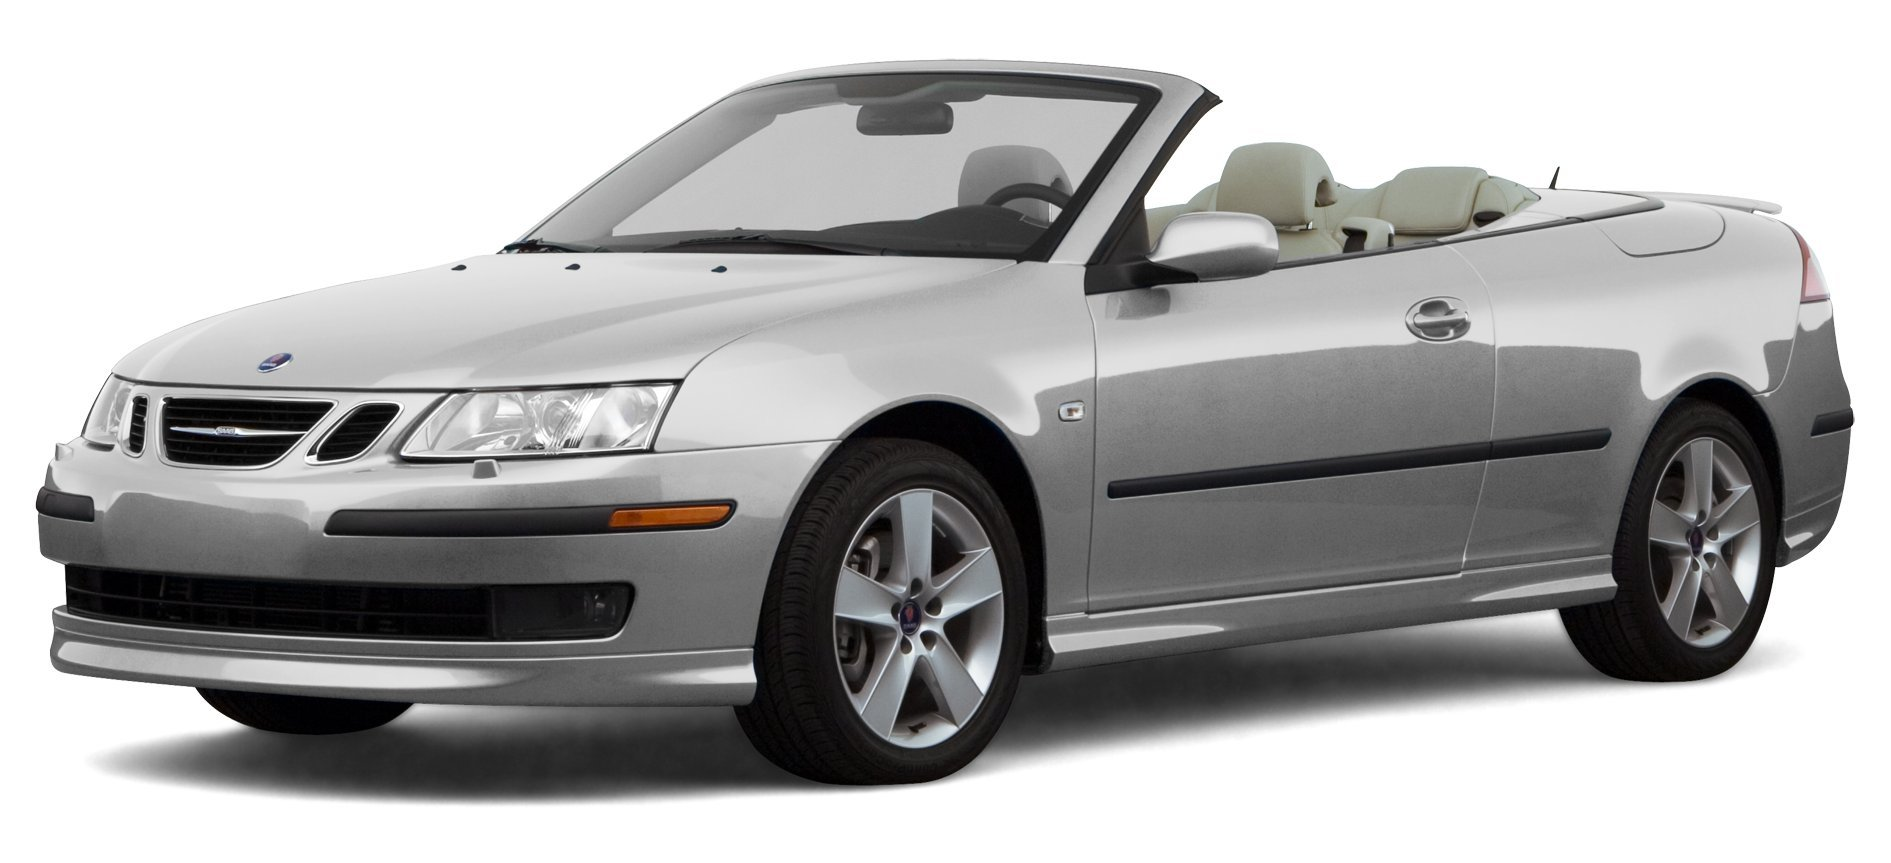 2007 saab 9 3 reviews images and specs vehicles. Black Bedroom Furniture Sets. Home Design Ideas